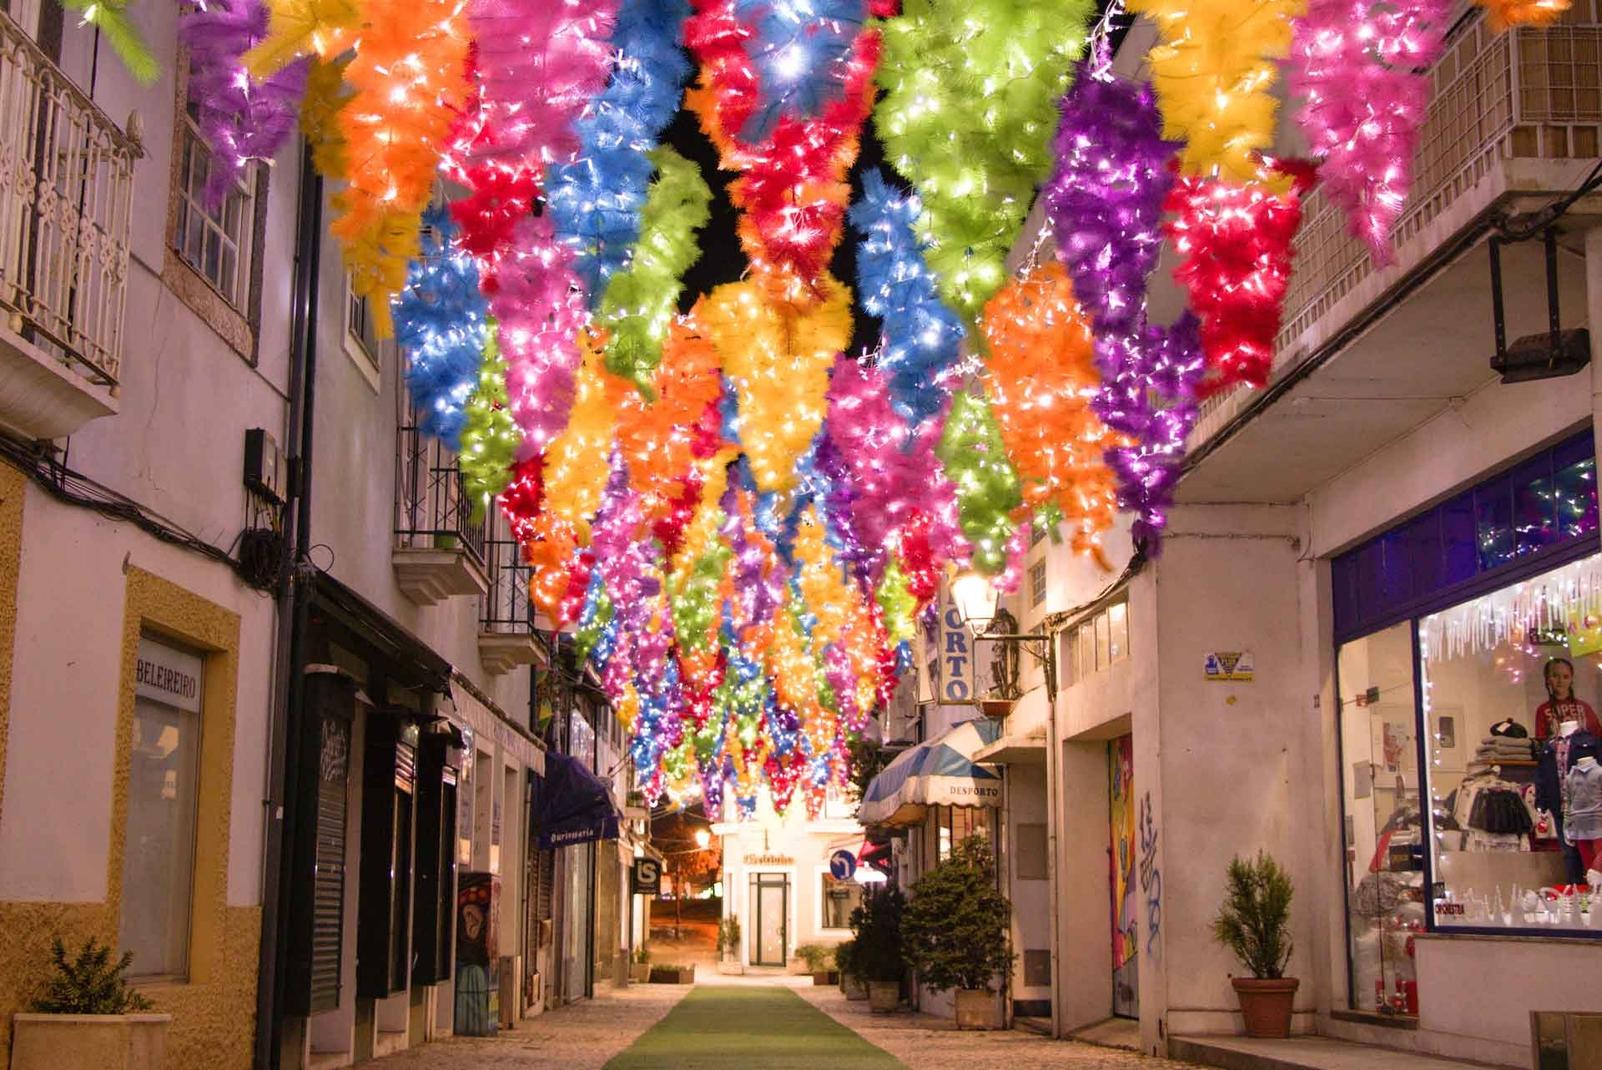 Projet Umbrella Sky - Noël à Águeda '19